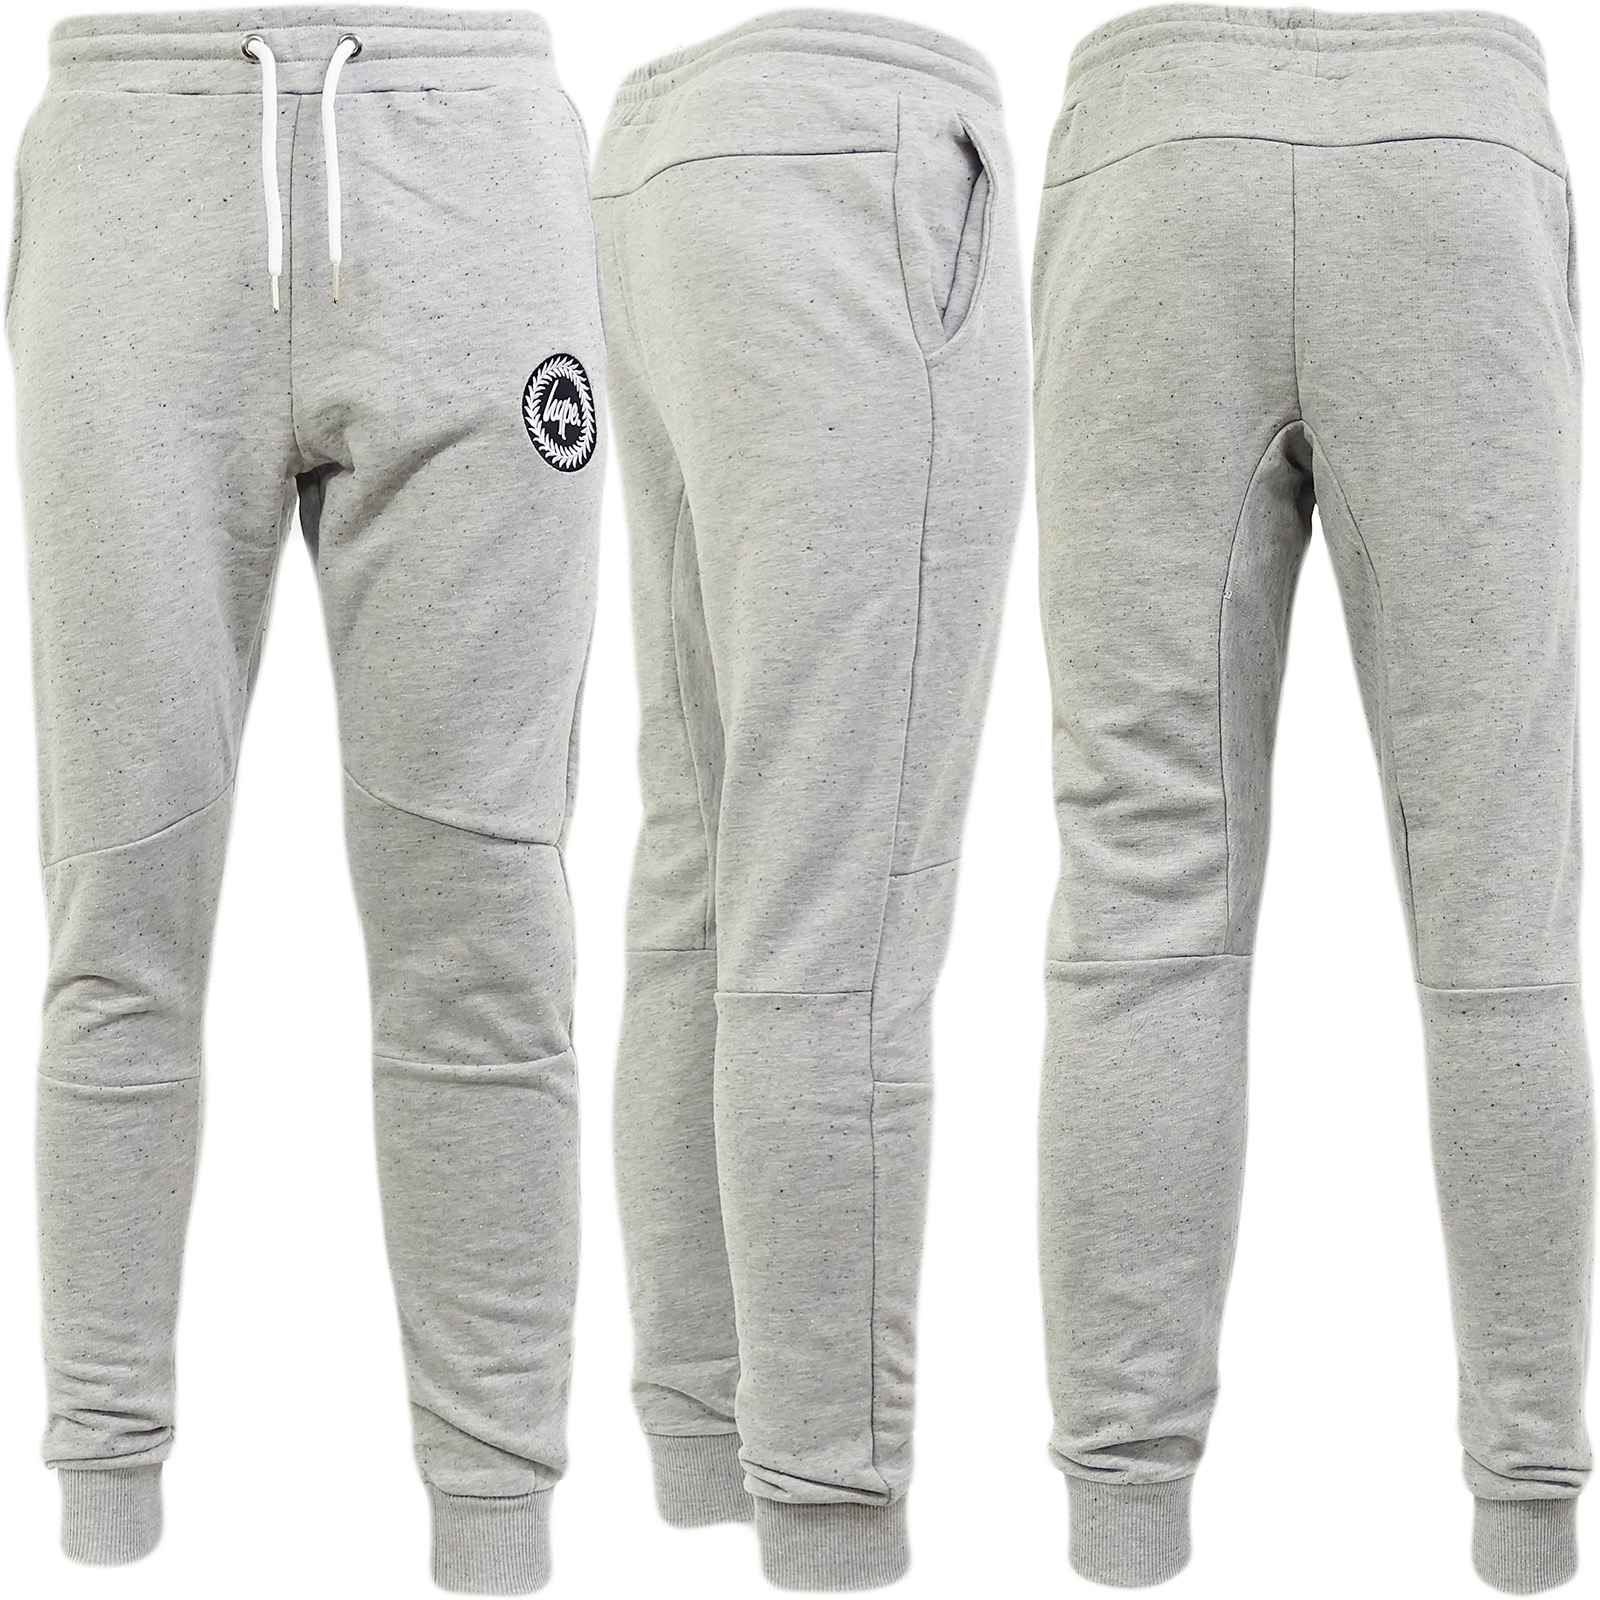 Hype Grey Speckled Slim Fit Tapered Jogger / Sweatpant Flec Crest -